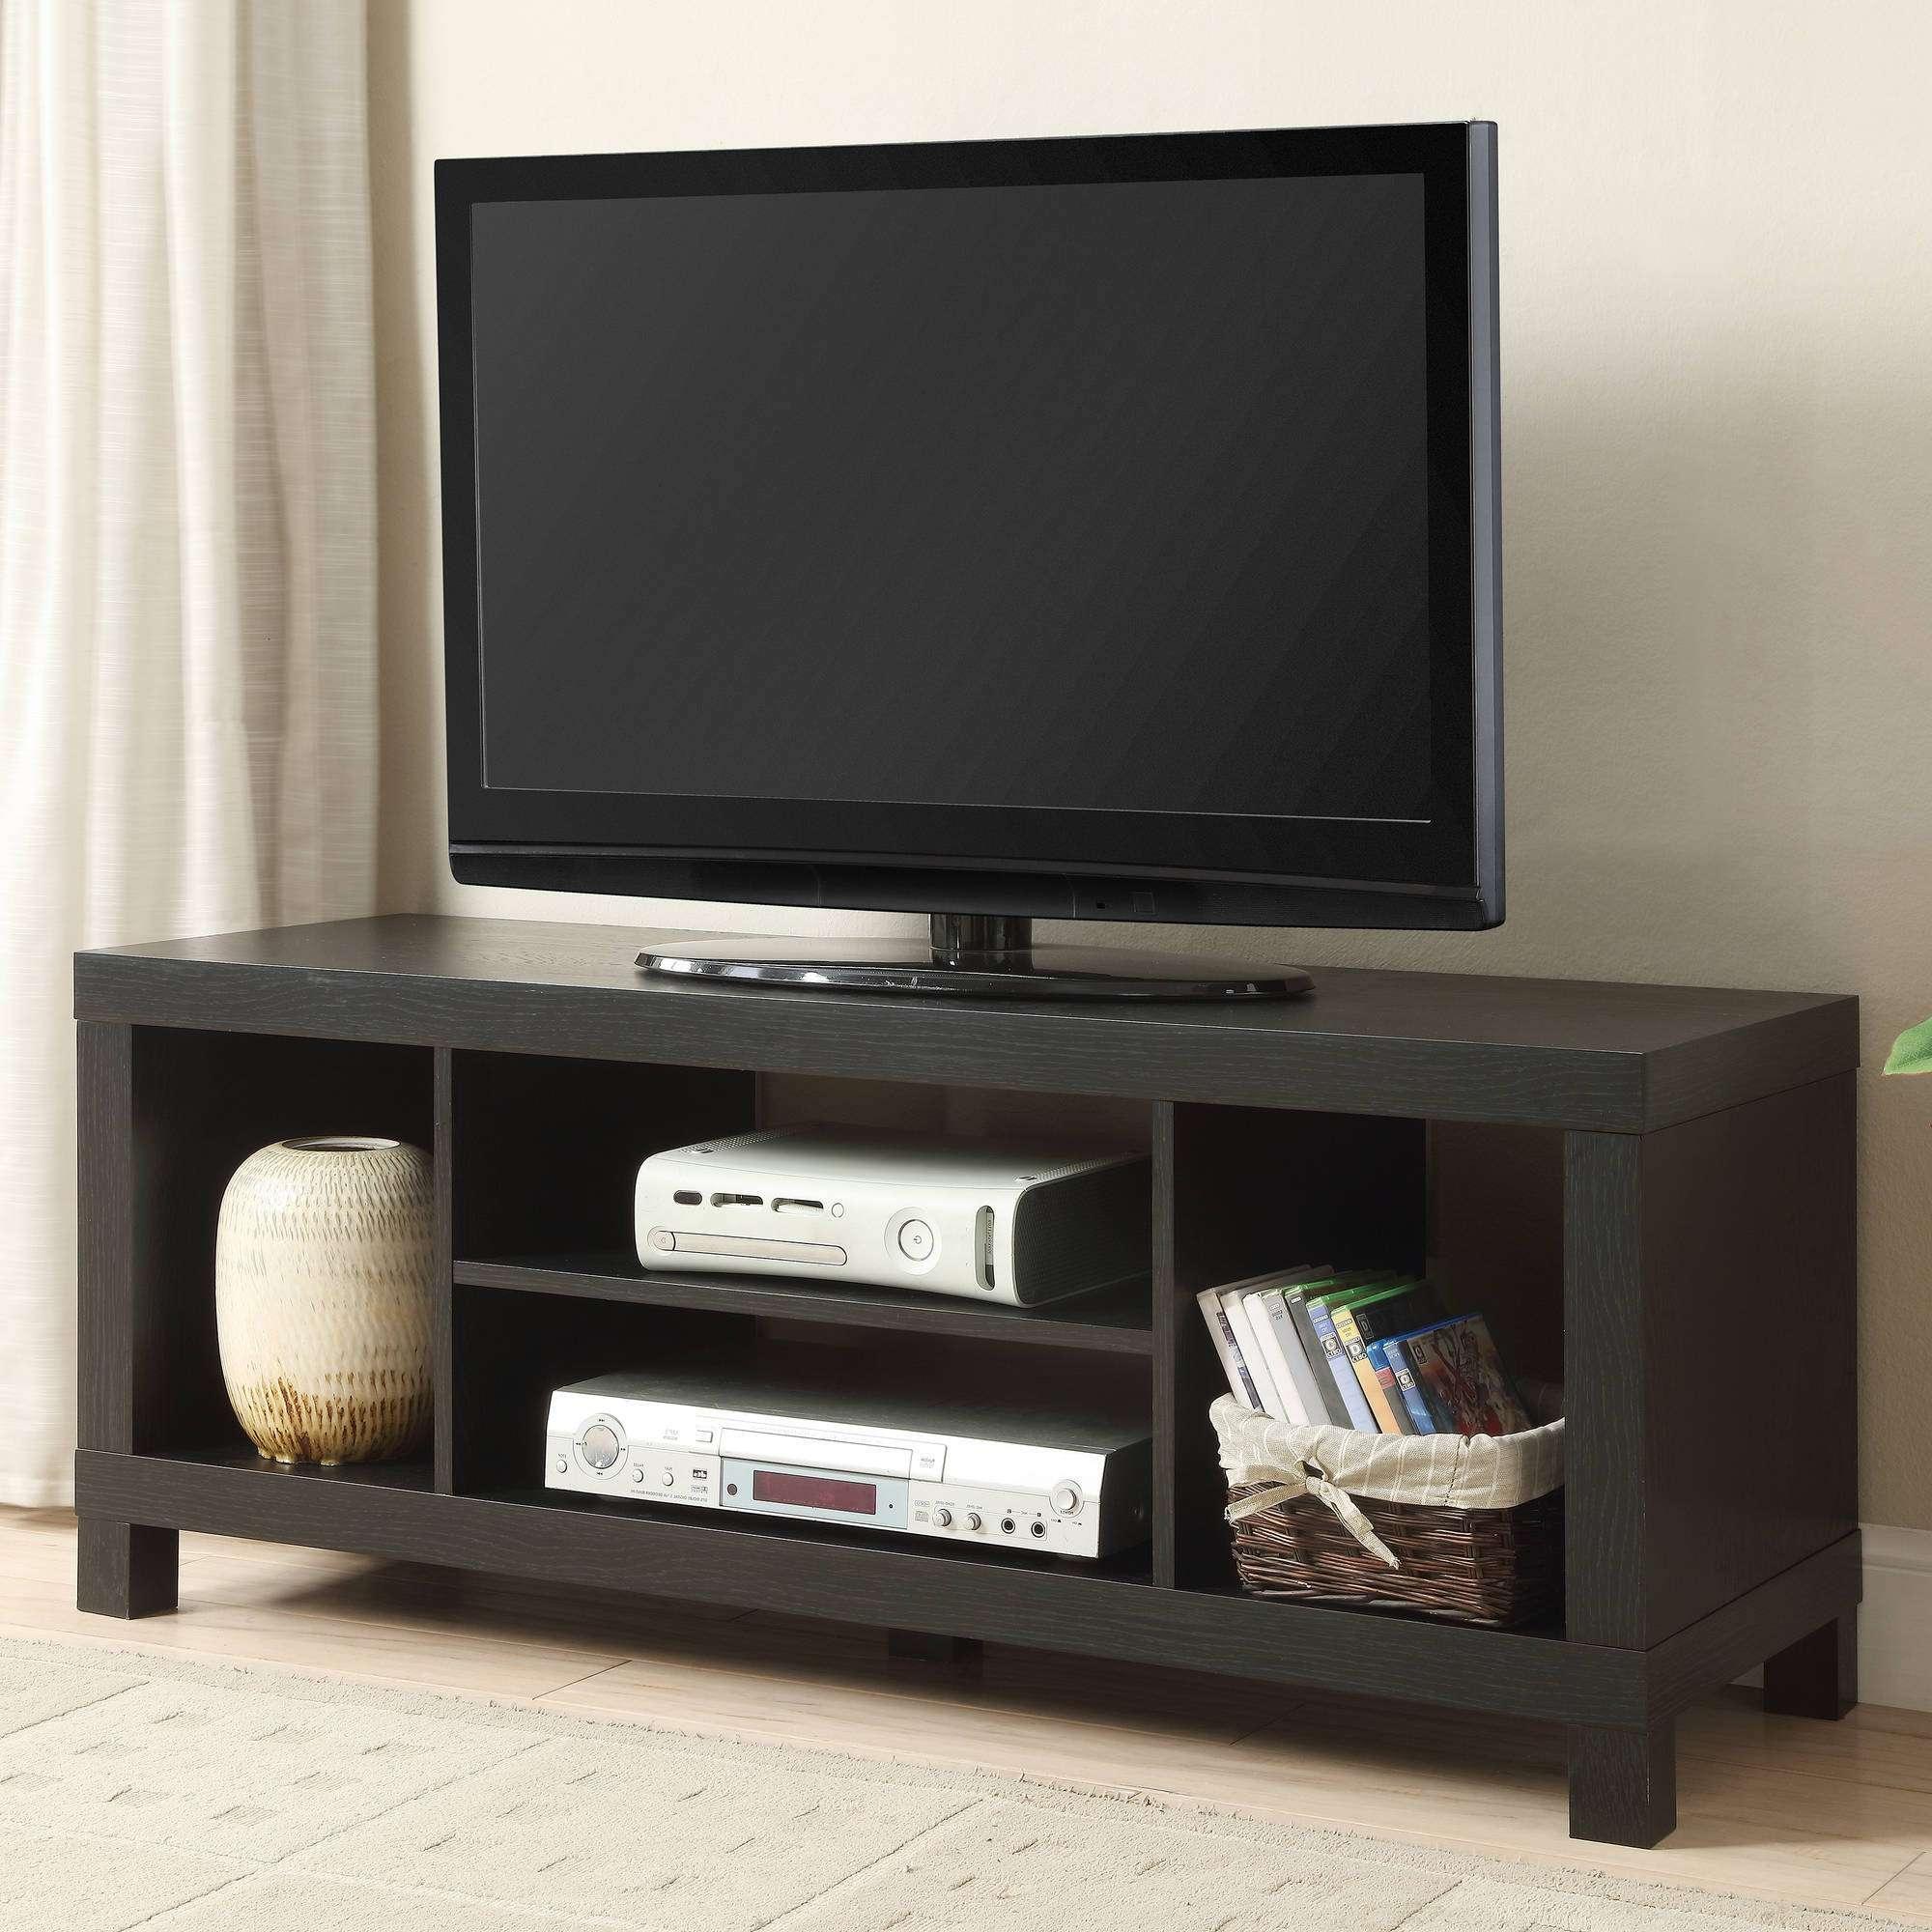 Tv : Noteworthy Tv Stands For Flat Screens Big Lots Arresting Tv Regarding Unique Tv Stands For Flat Screens (View 3 of 20)